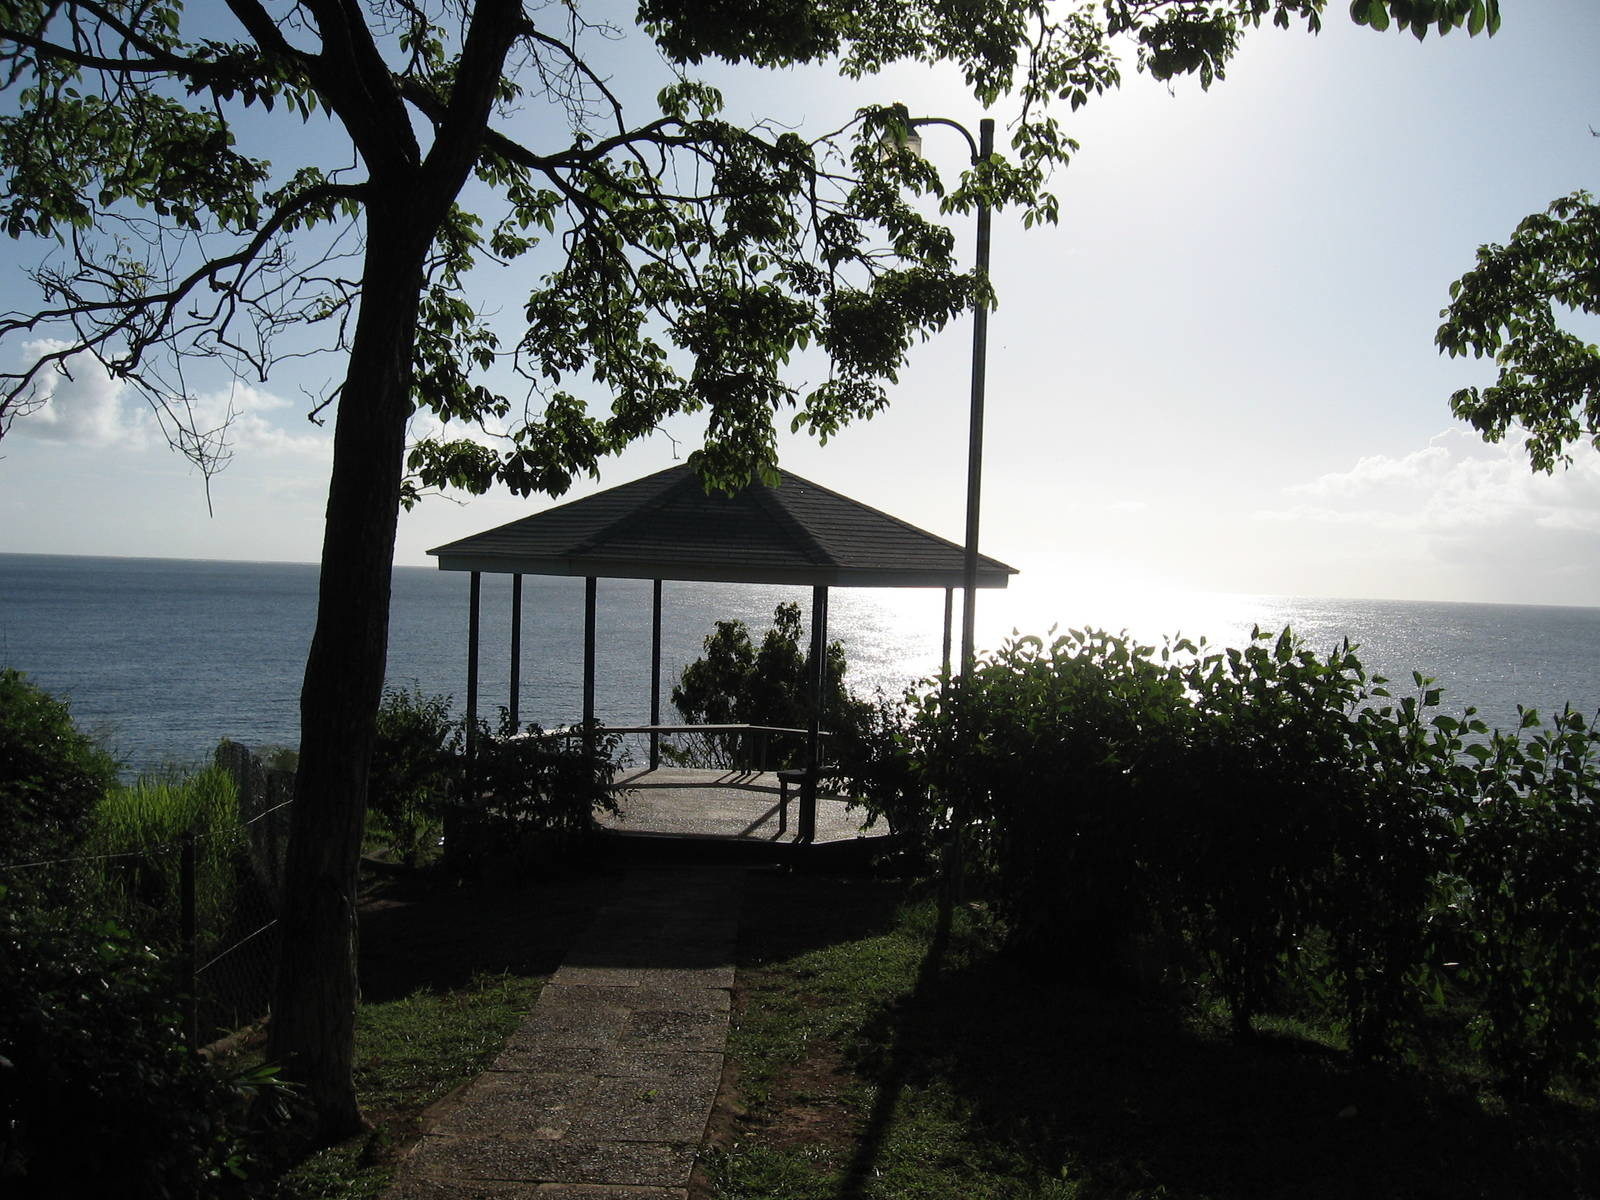 outlet store 2d287 4d740 Fort Bennet: Destination Trinidad and Tobago | Tours ...